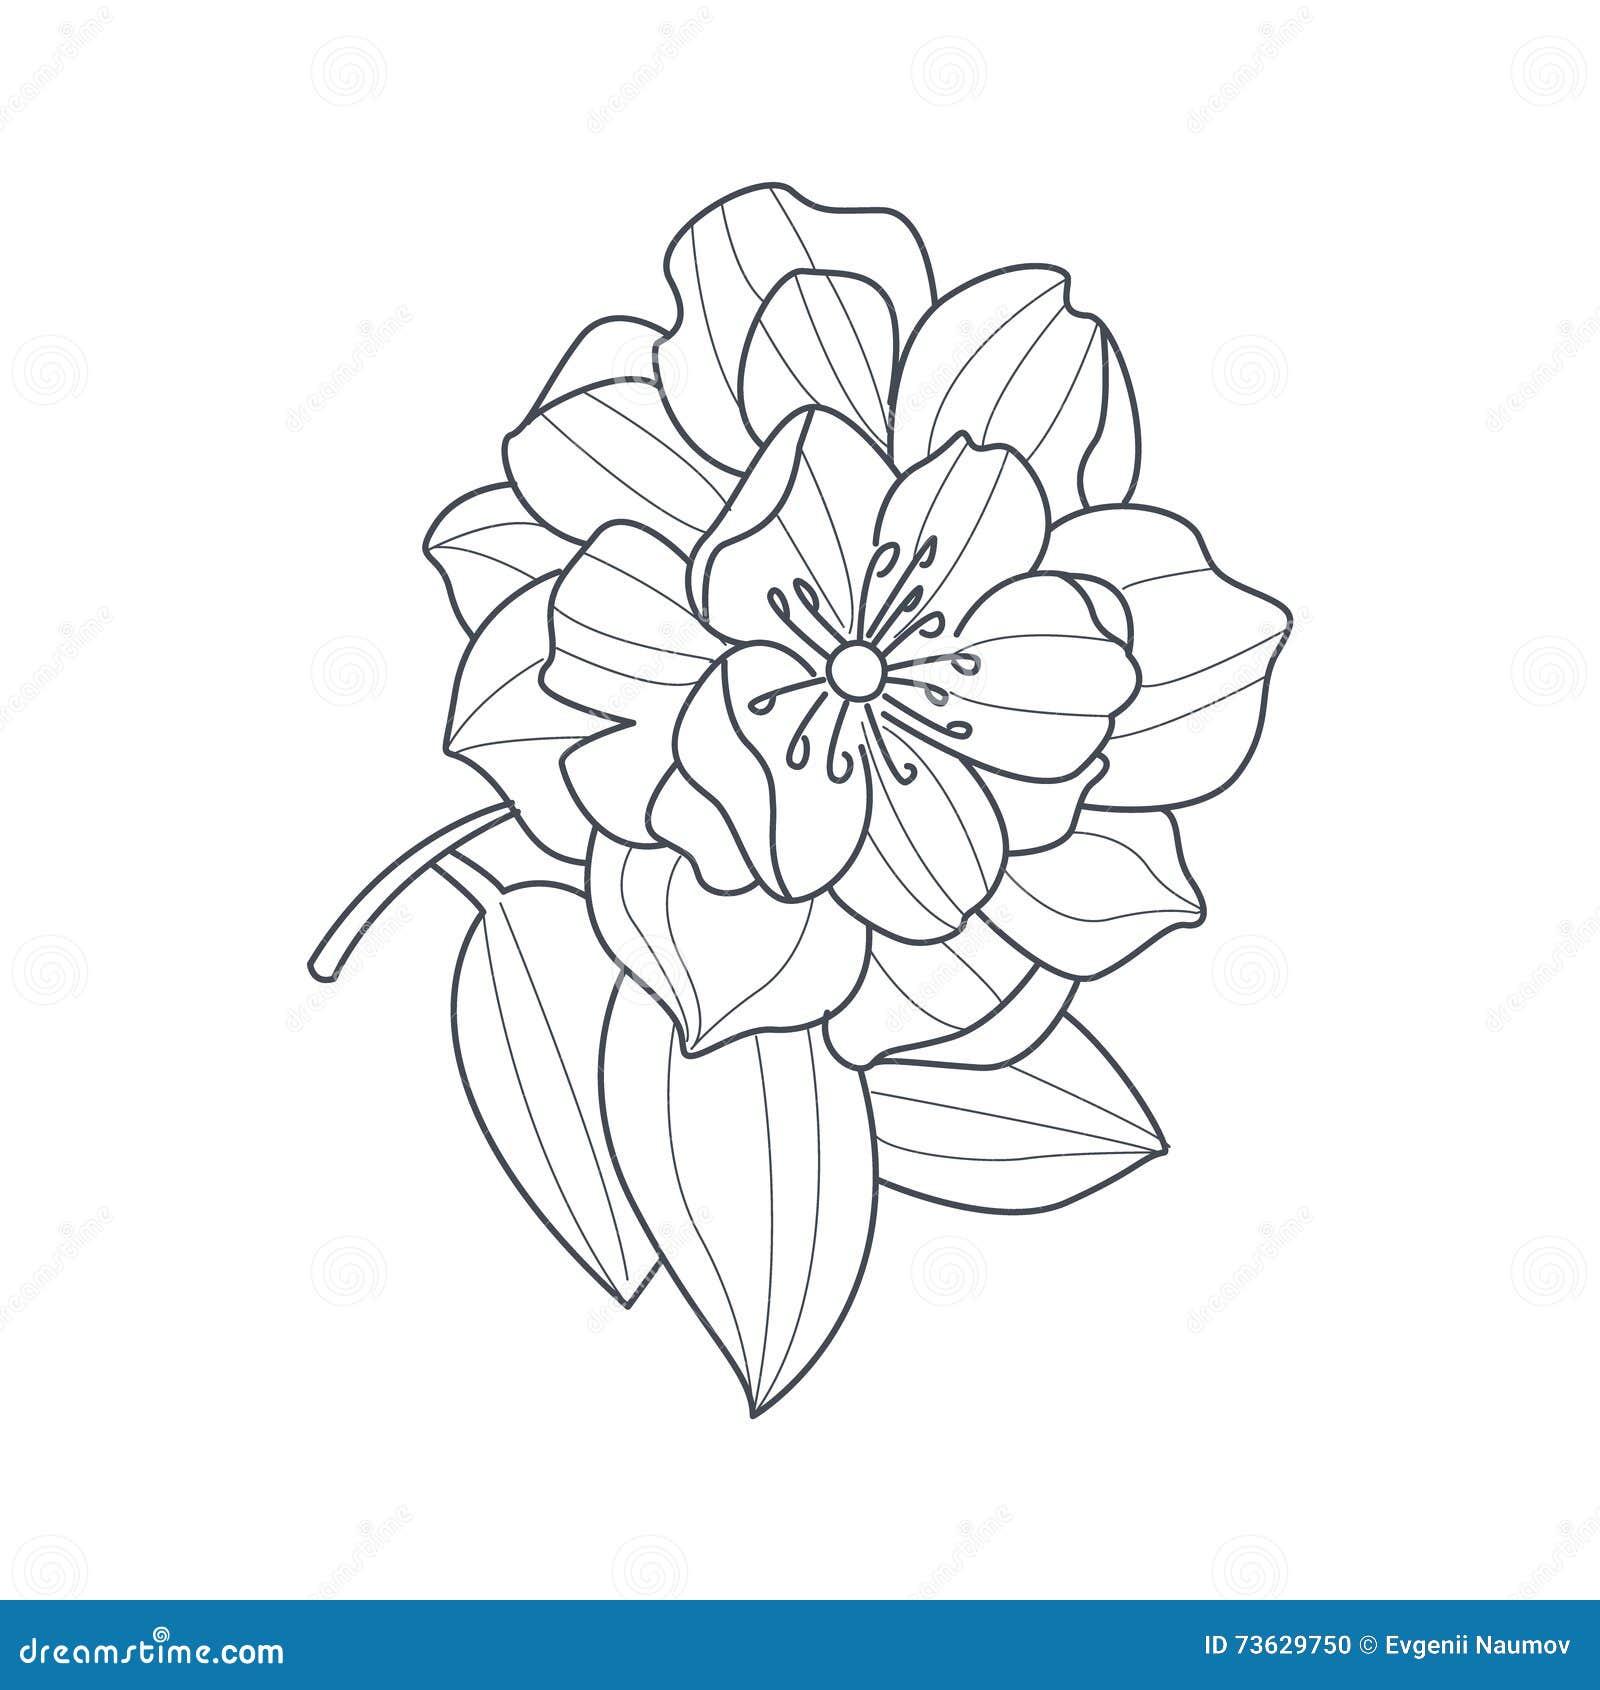 fully open peony flower monochrome drawing for coloring hydrangea clip art b&w hydrangea clipart border